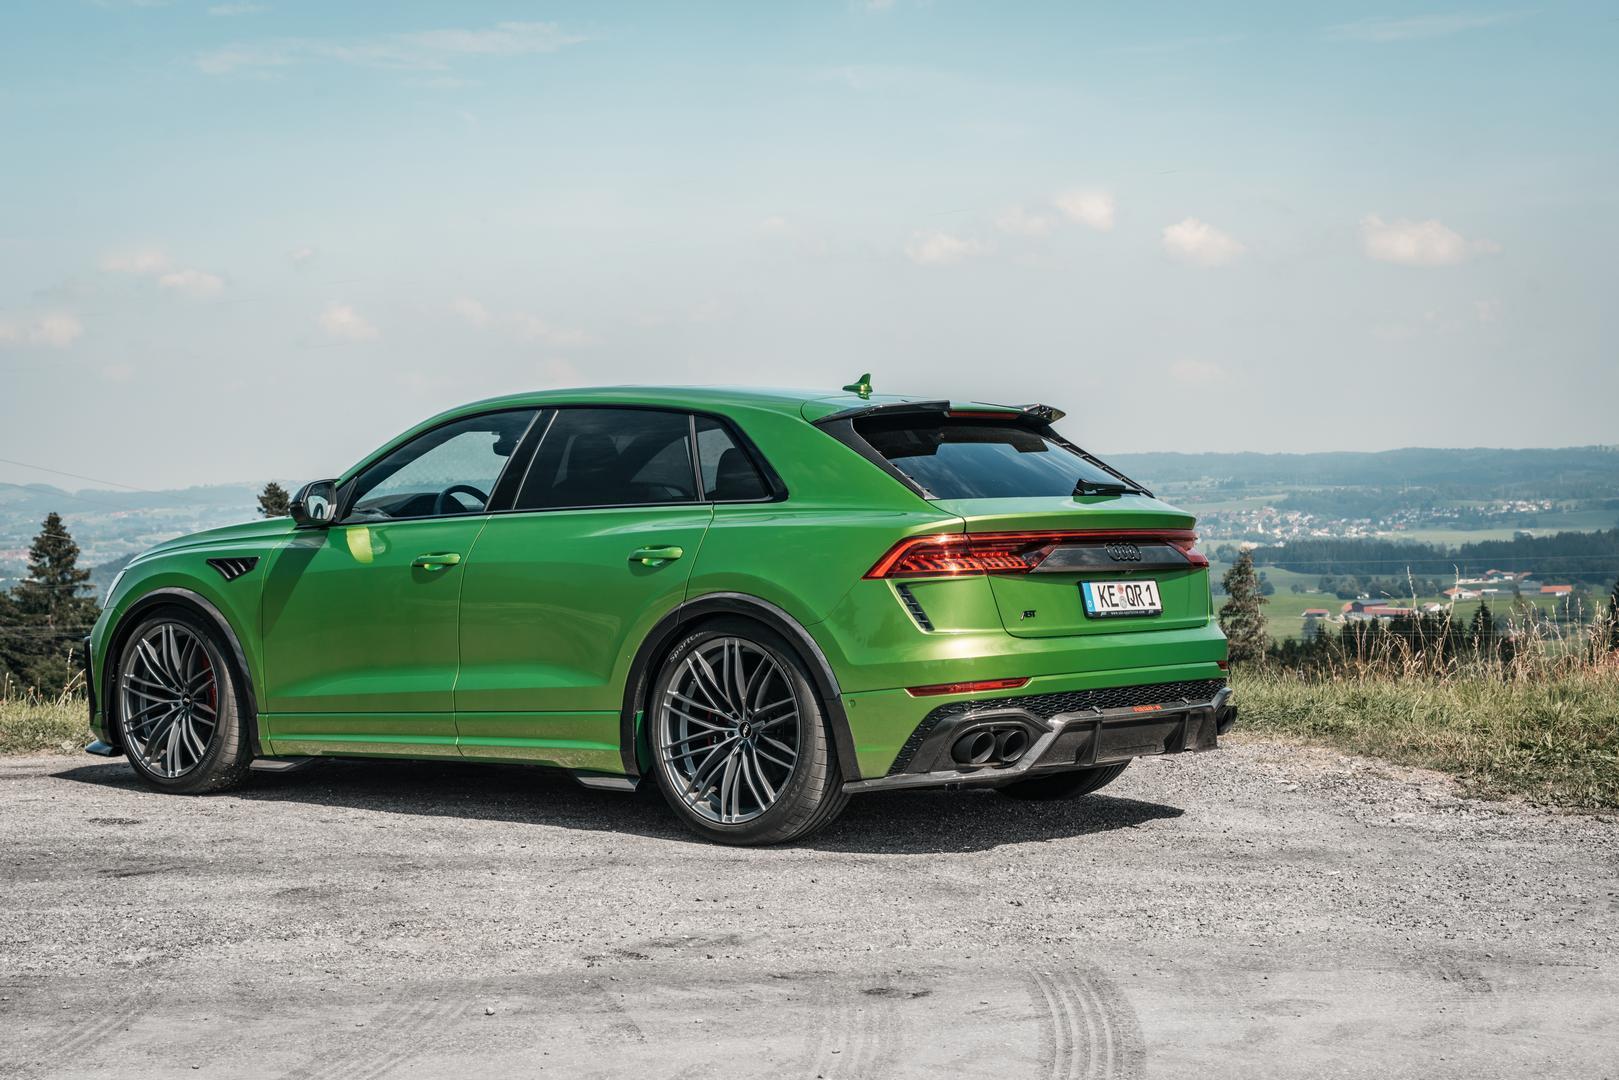 Green RS Q8